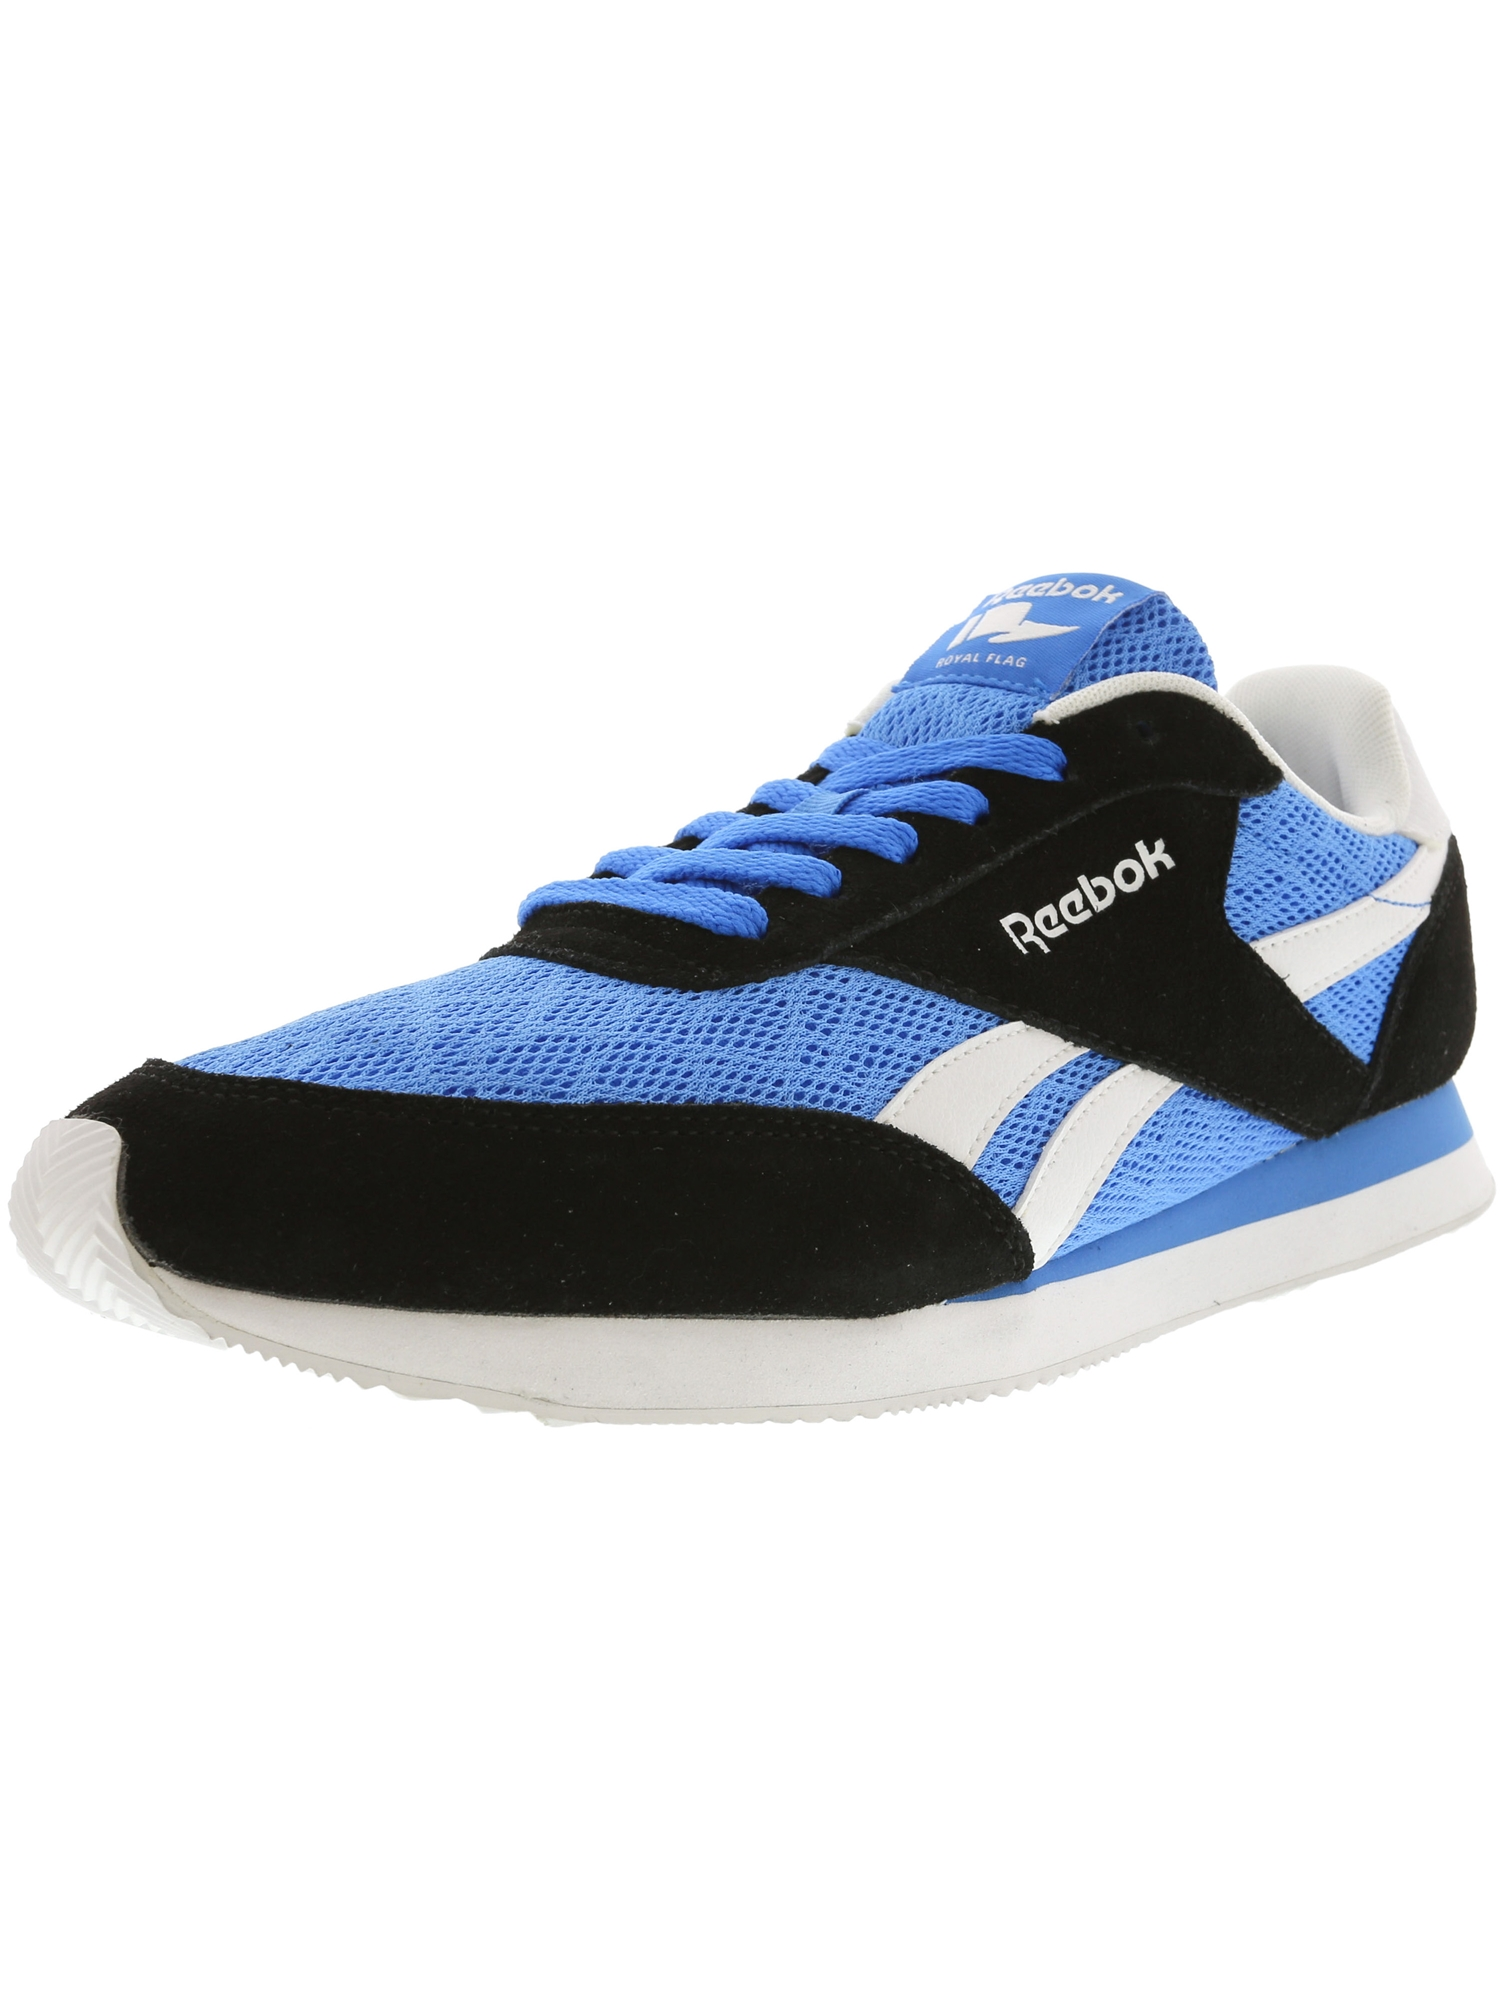 Reebok Men's Royal Cl Jog 2Tm Horizon Blue / Black White Ankle-High Running Shoe - 9M